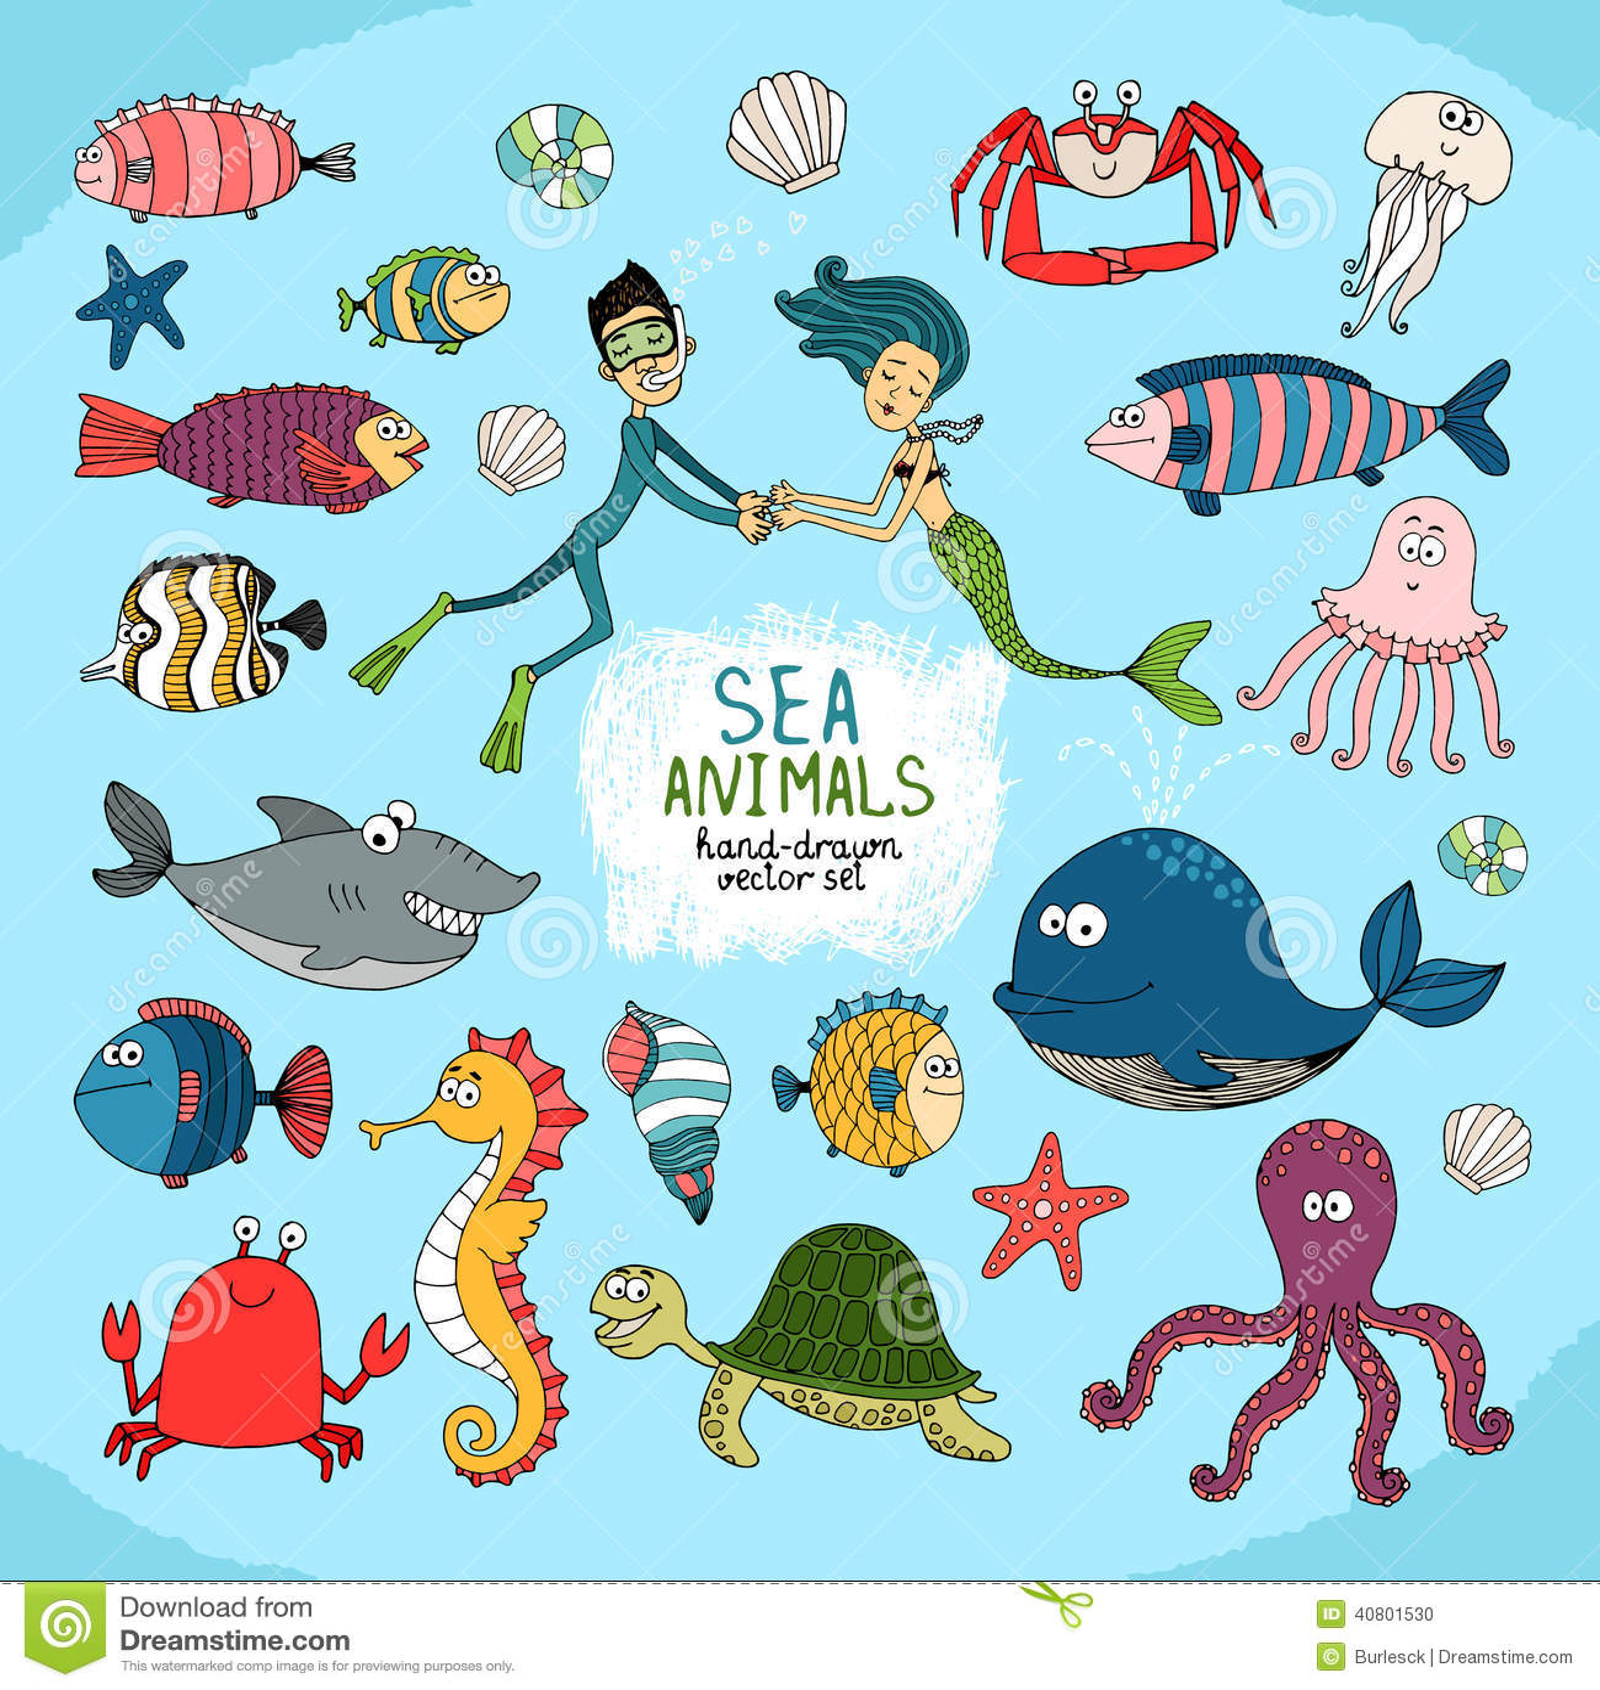 jellyfish cartoon set royalty free stock images image 25755759